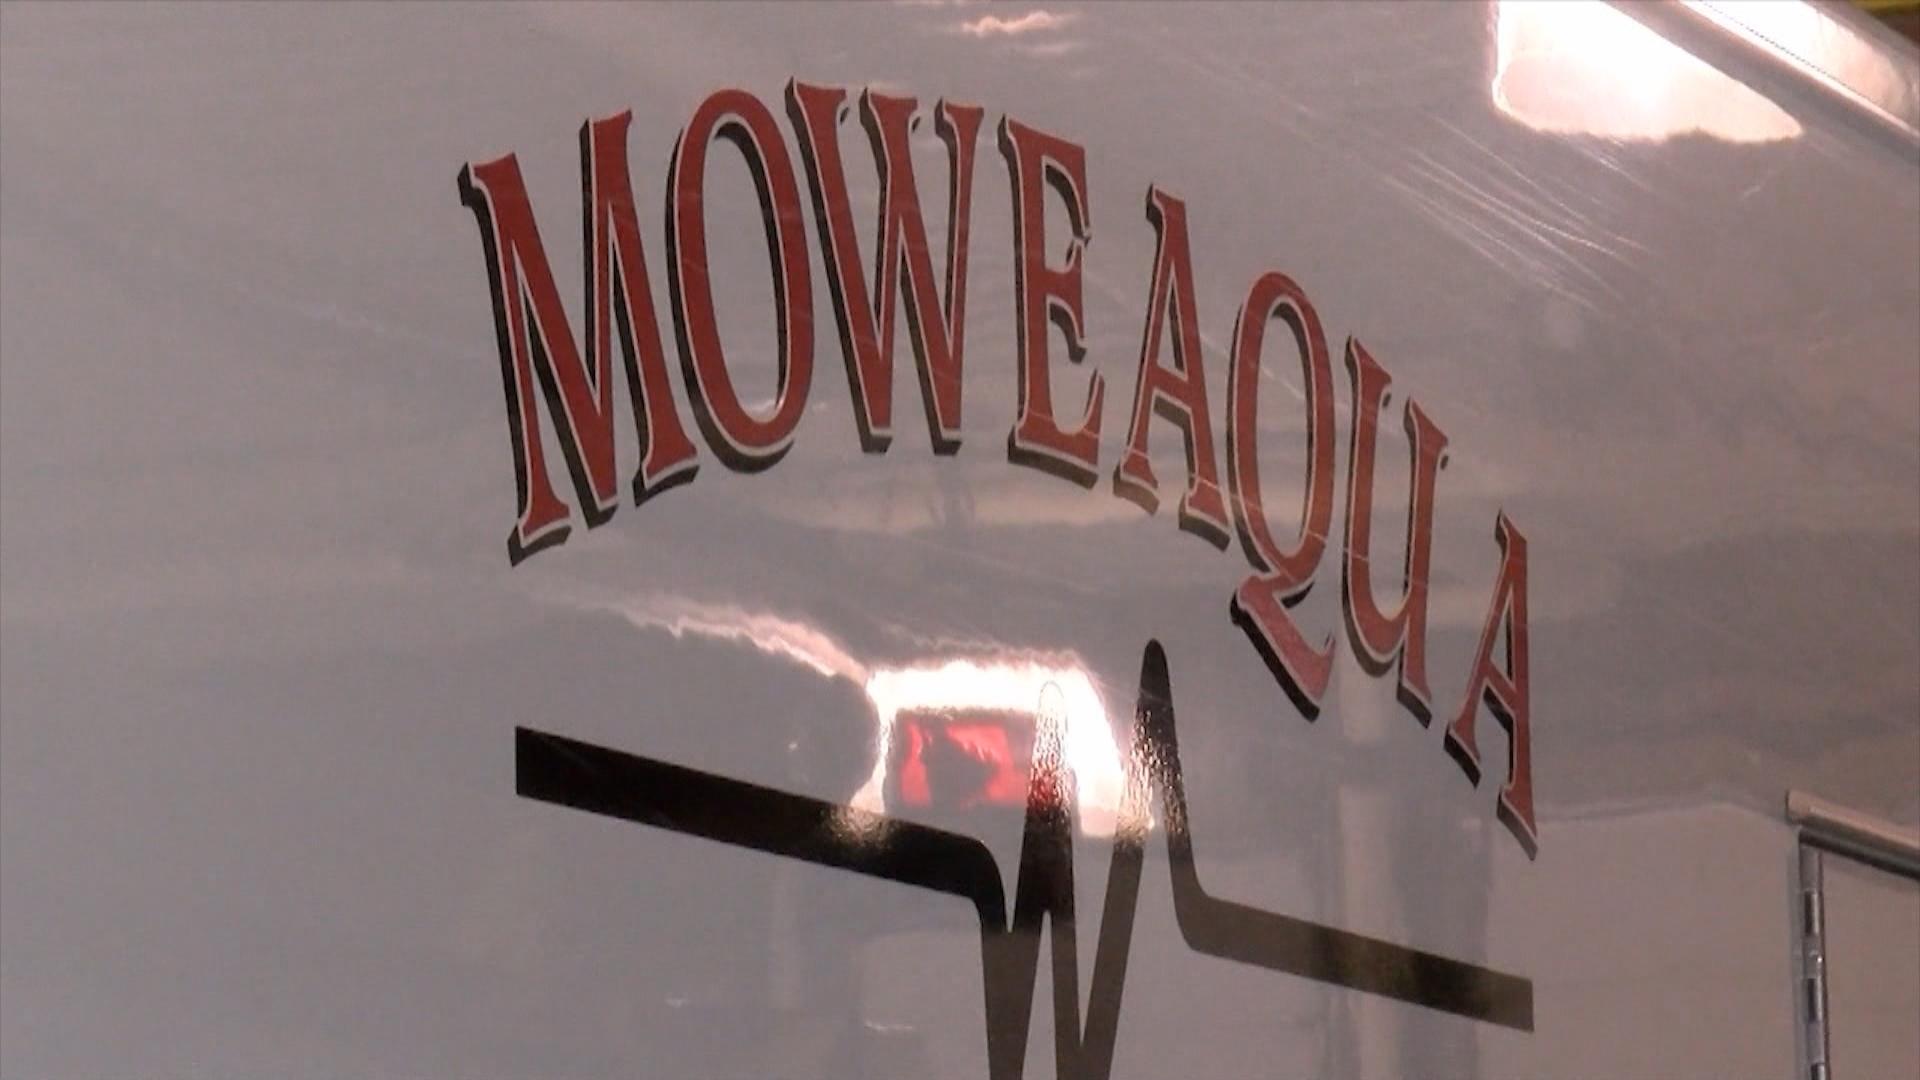 moweaqua ambulance_1525208835167.jpg.jpg